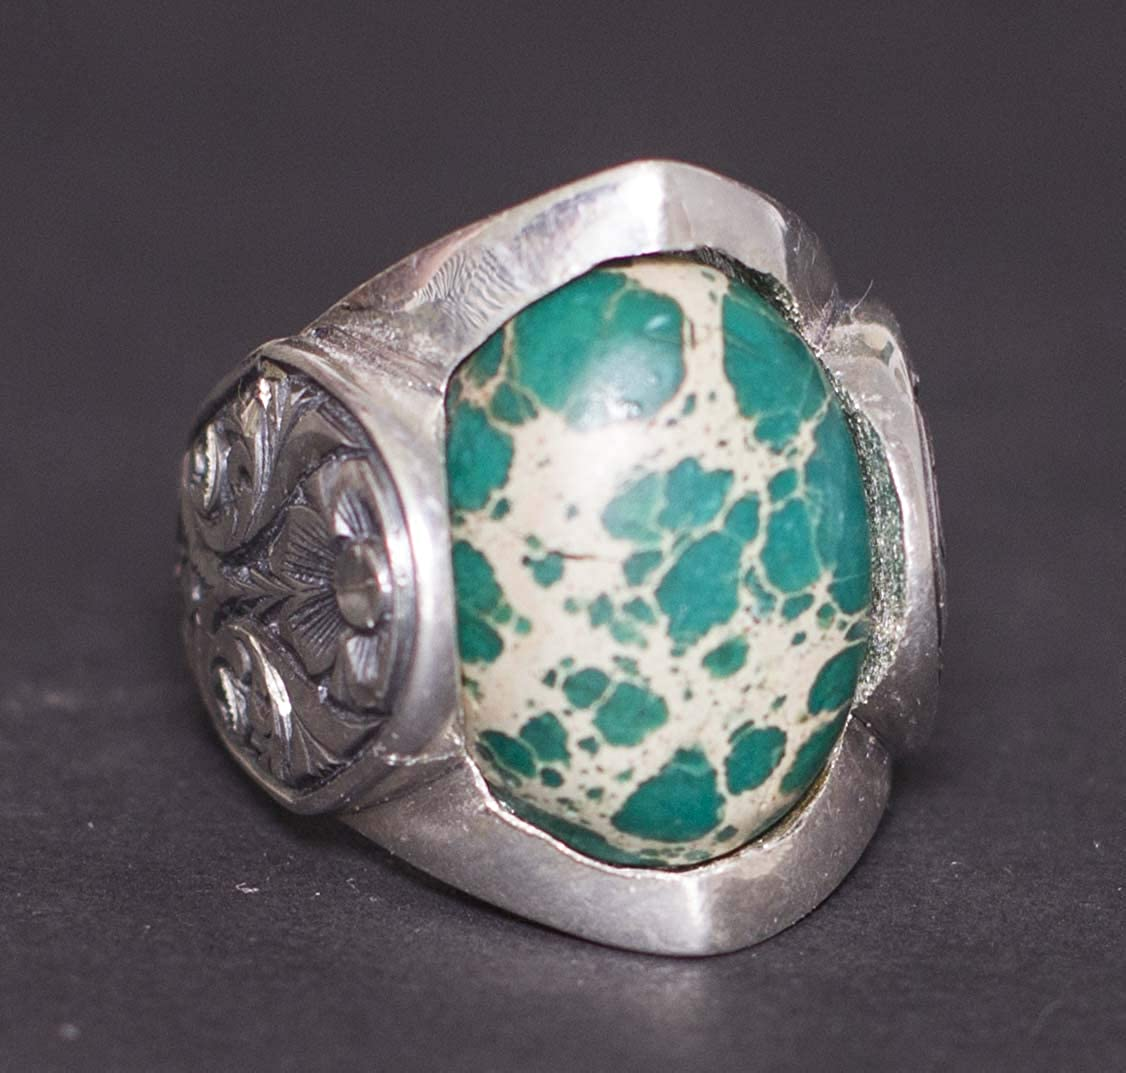 Free Express Shipping Labradorite Natural Gemstone Lapis Lazuli Falcon Jewelry Tiger Eye 925 Sterling Silver Mens Ring Jade Jasper Red Agate